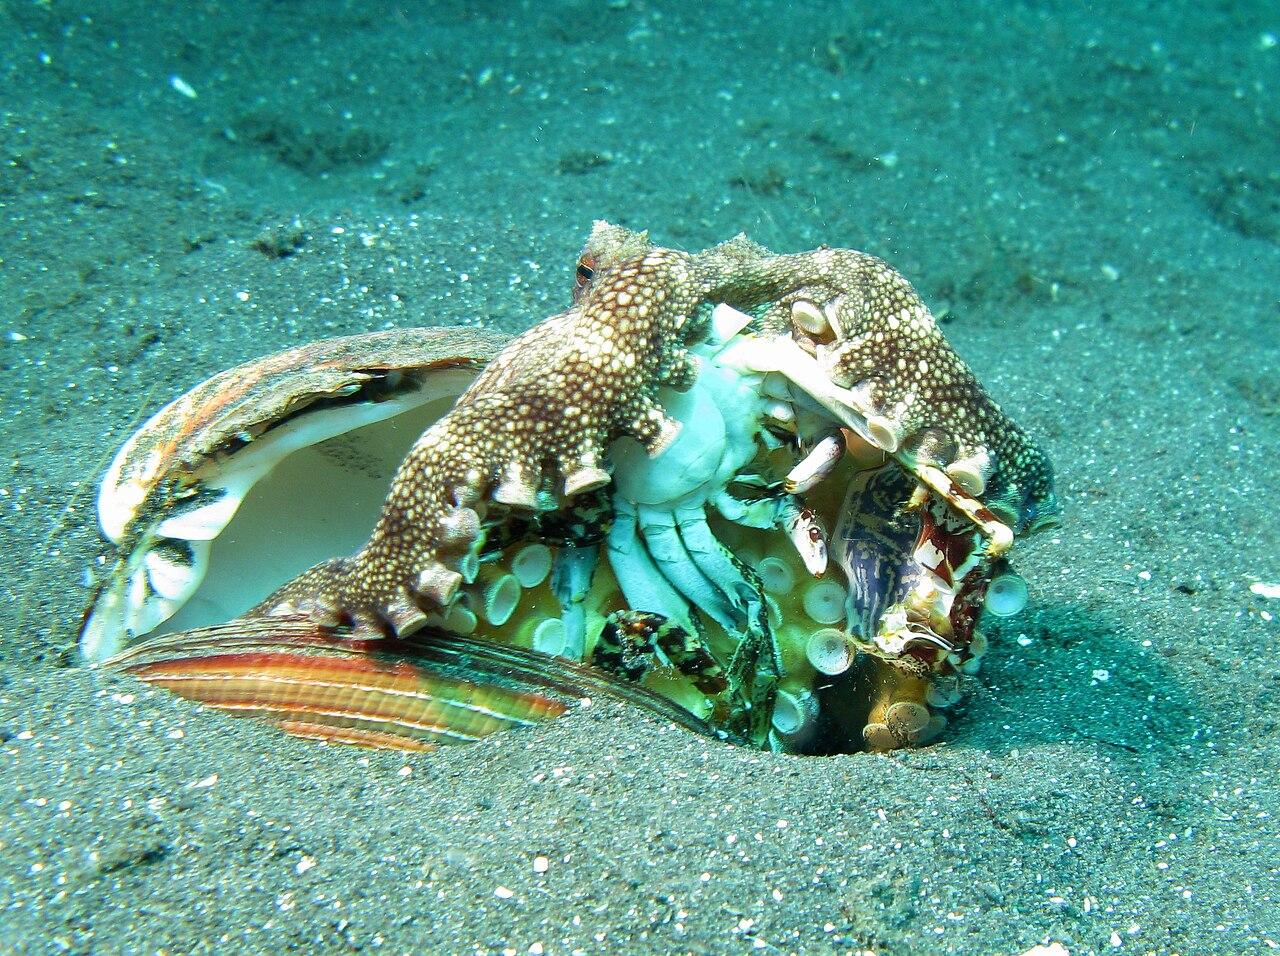 fileveined octopus amphioctopus marginatus eating a